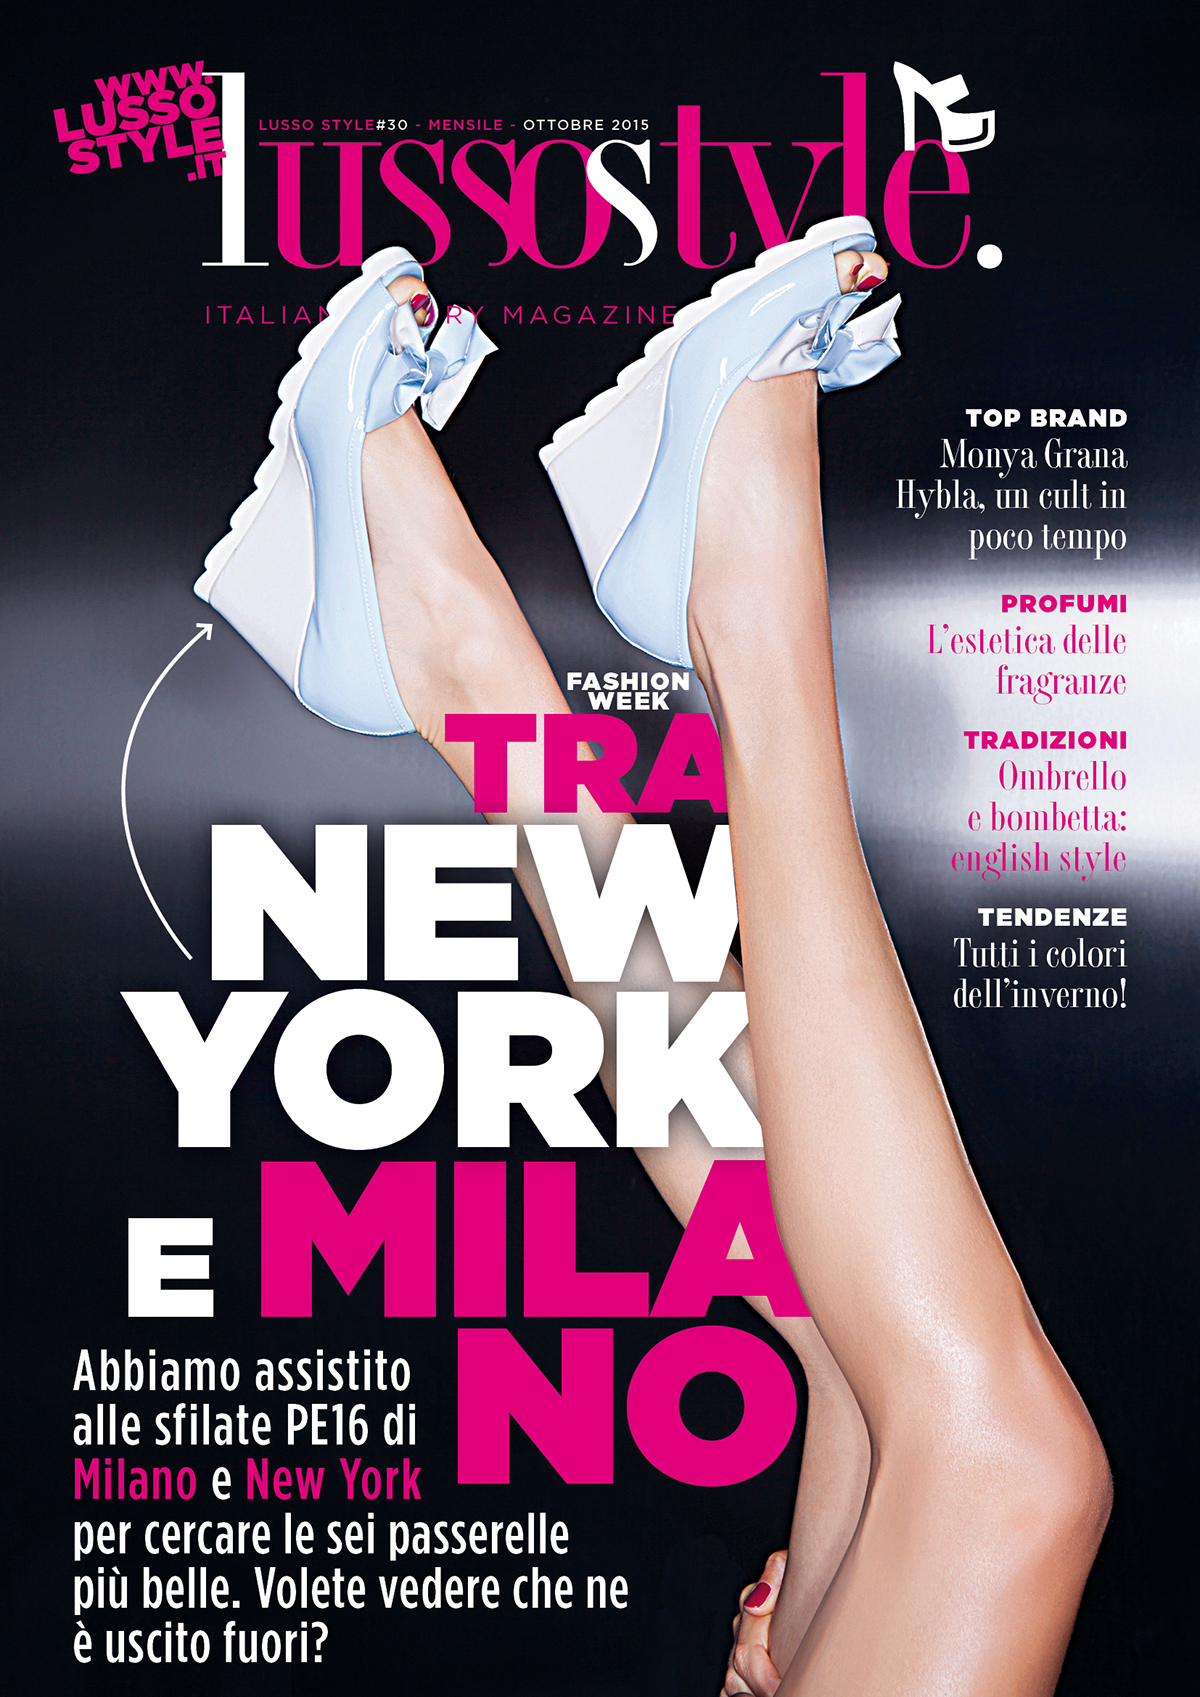 cover design,Lusso Style,Francesco Mazzenga,fashion week